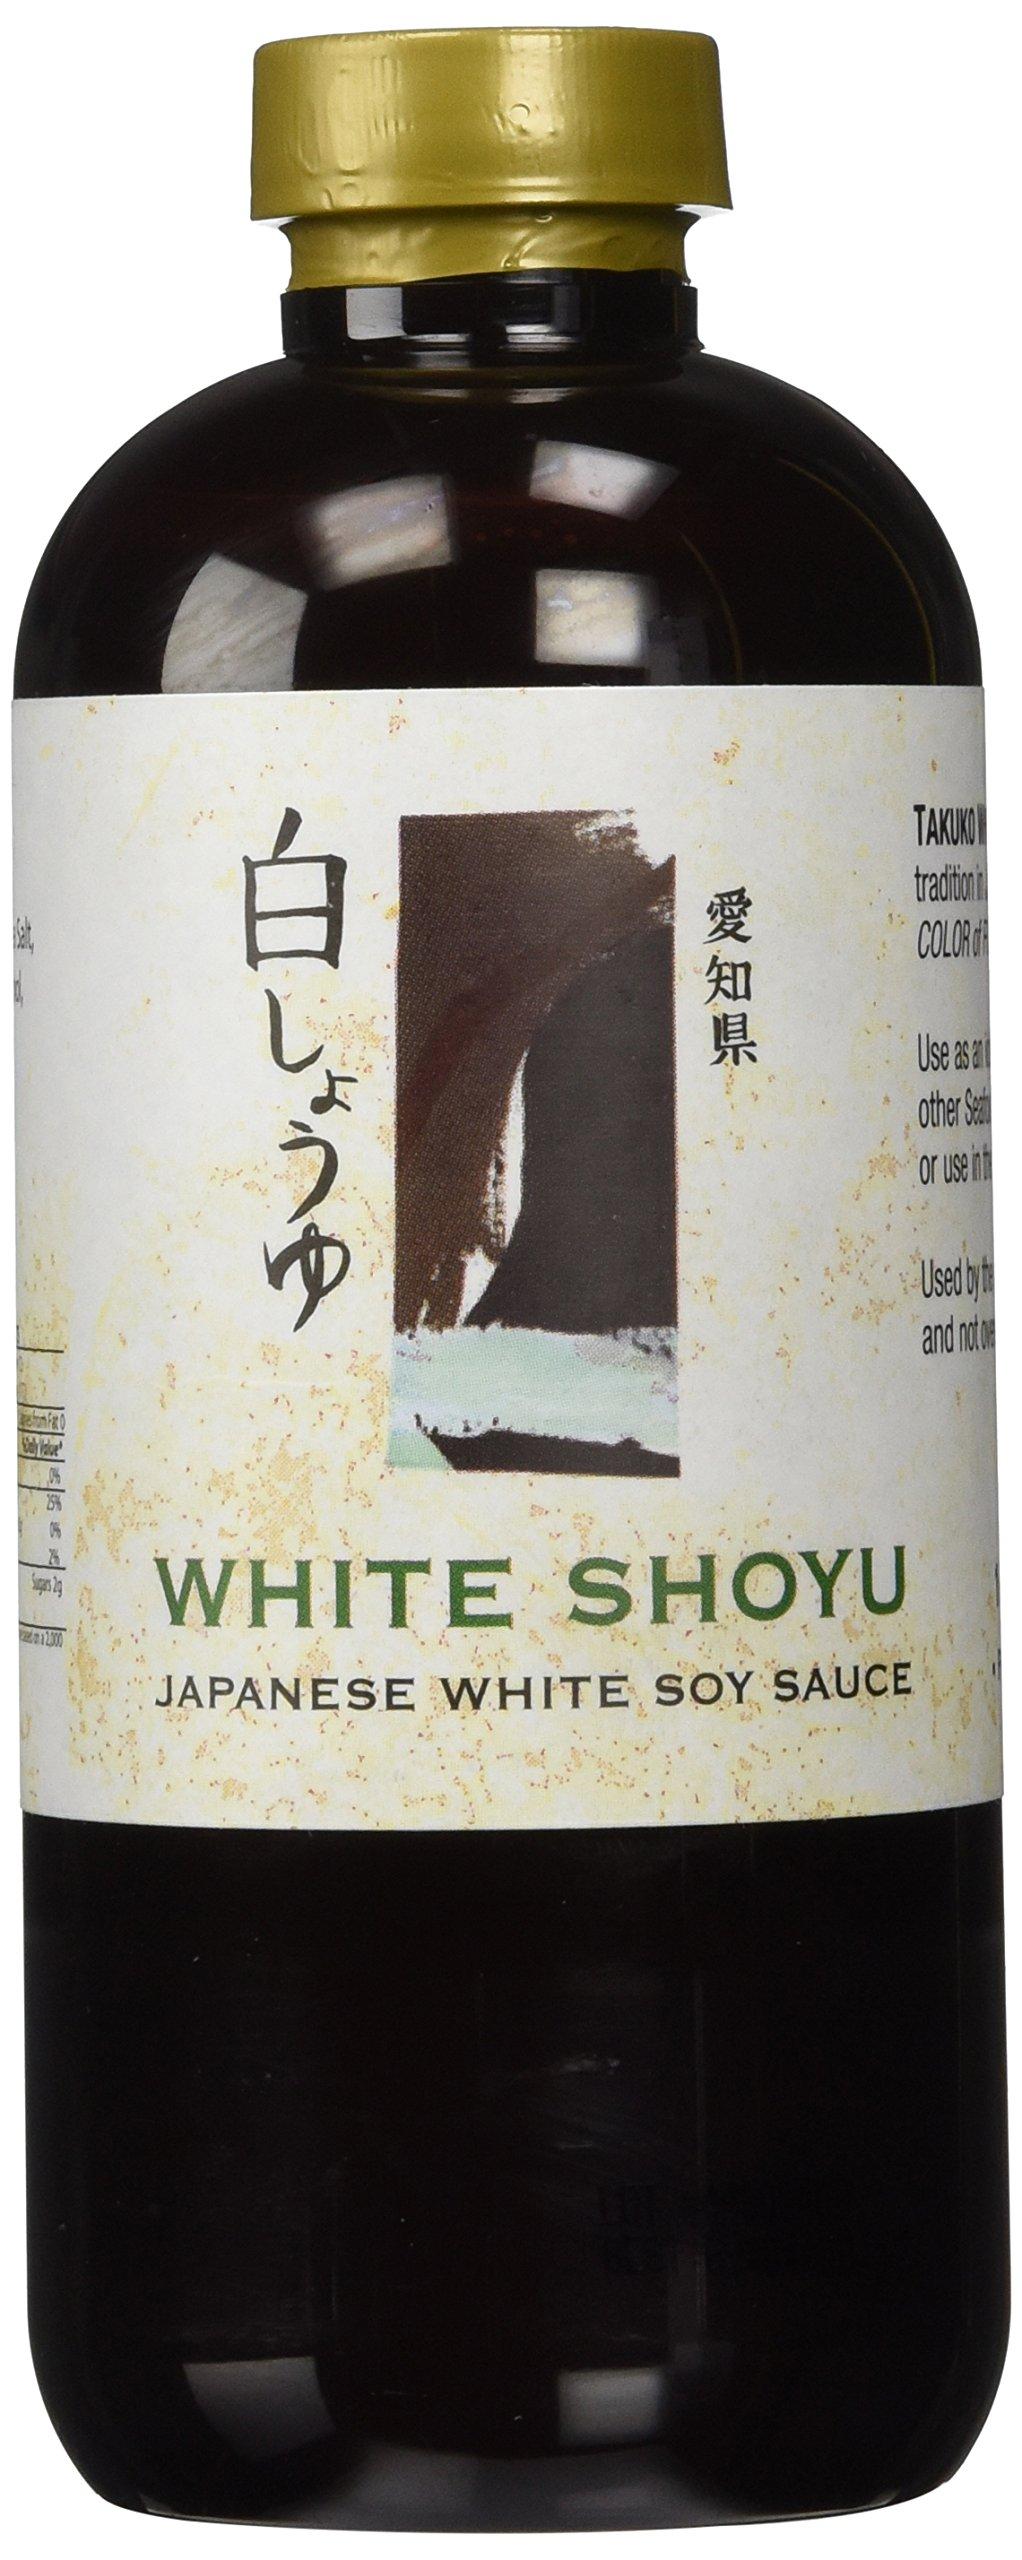 Takuko White Shoyu Japanese White Soy Sauce , 12 oz